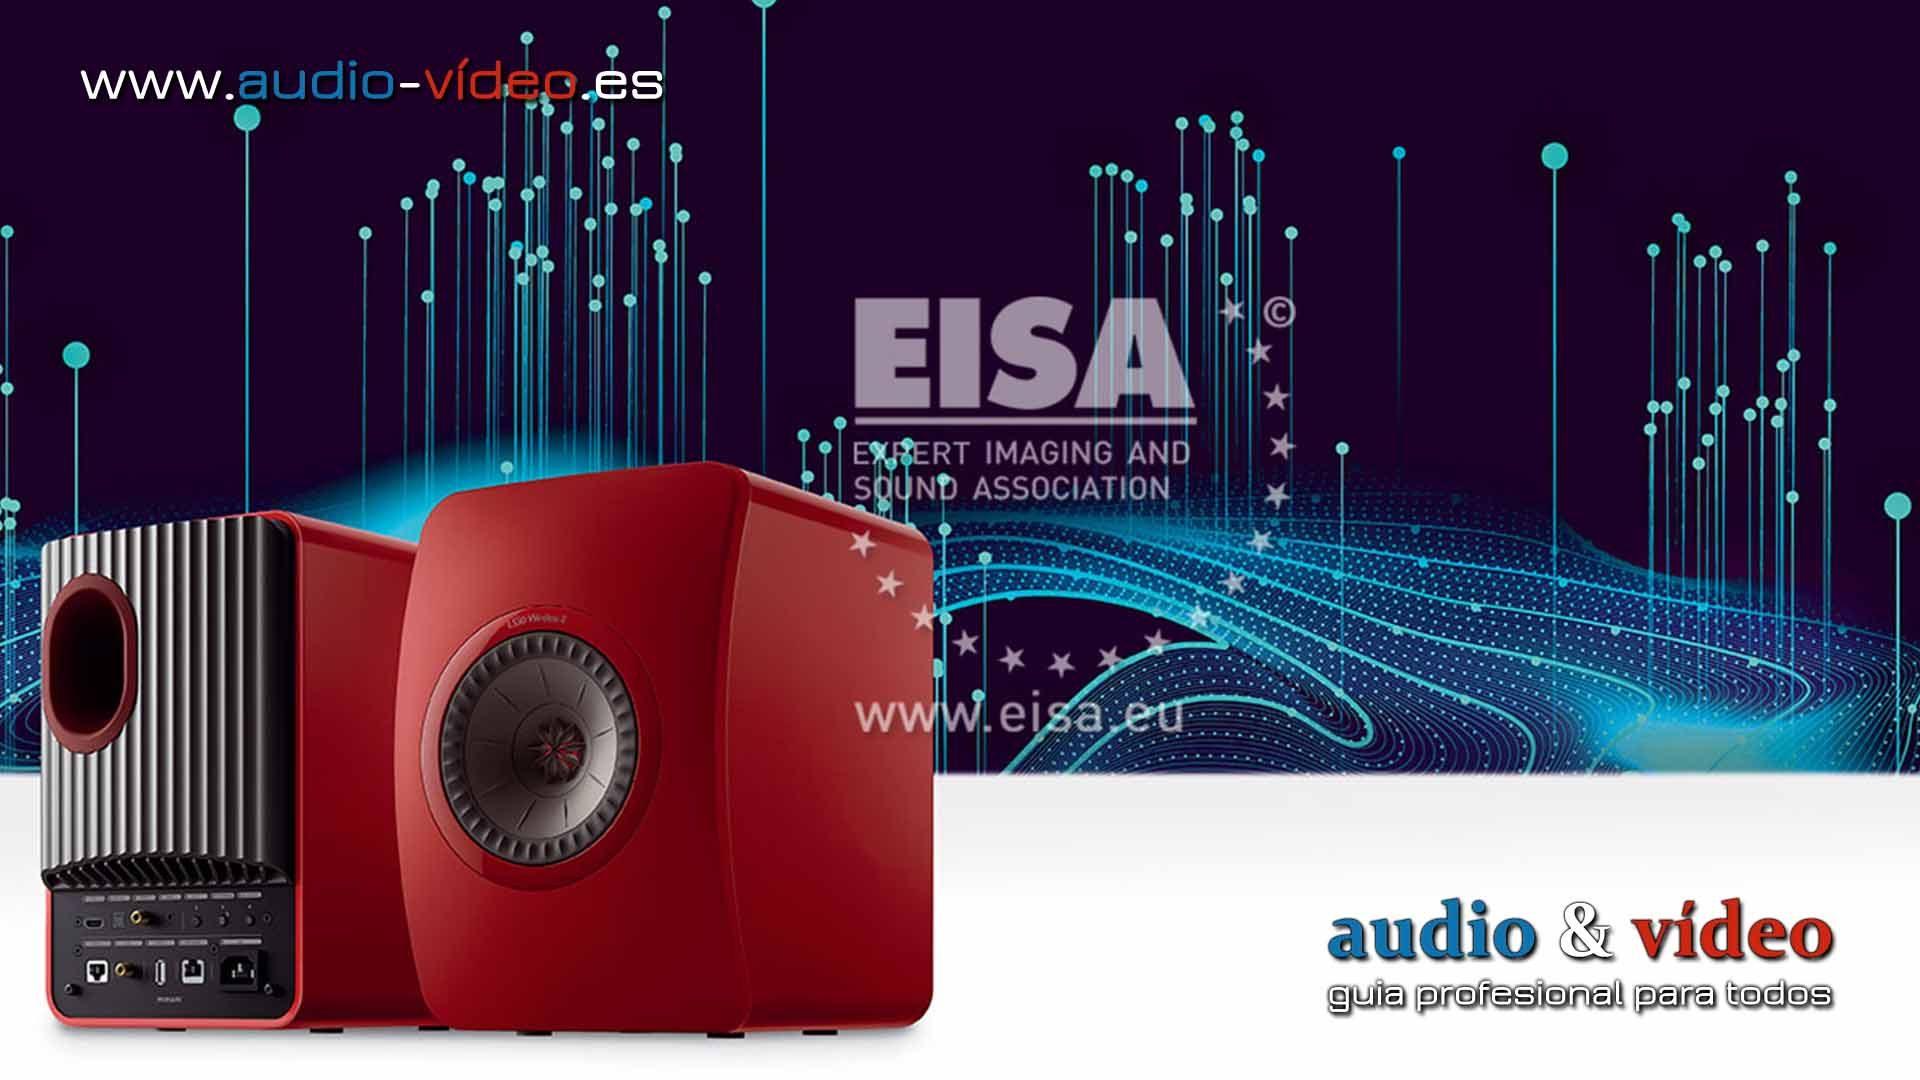 KEF LS50 Wireless II – altavoces inalámbricos EISA 2021-2022